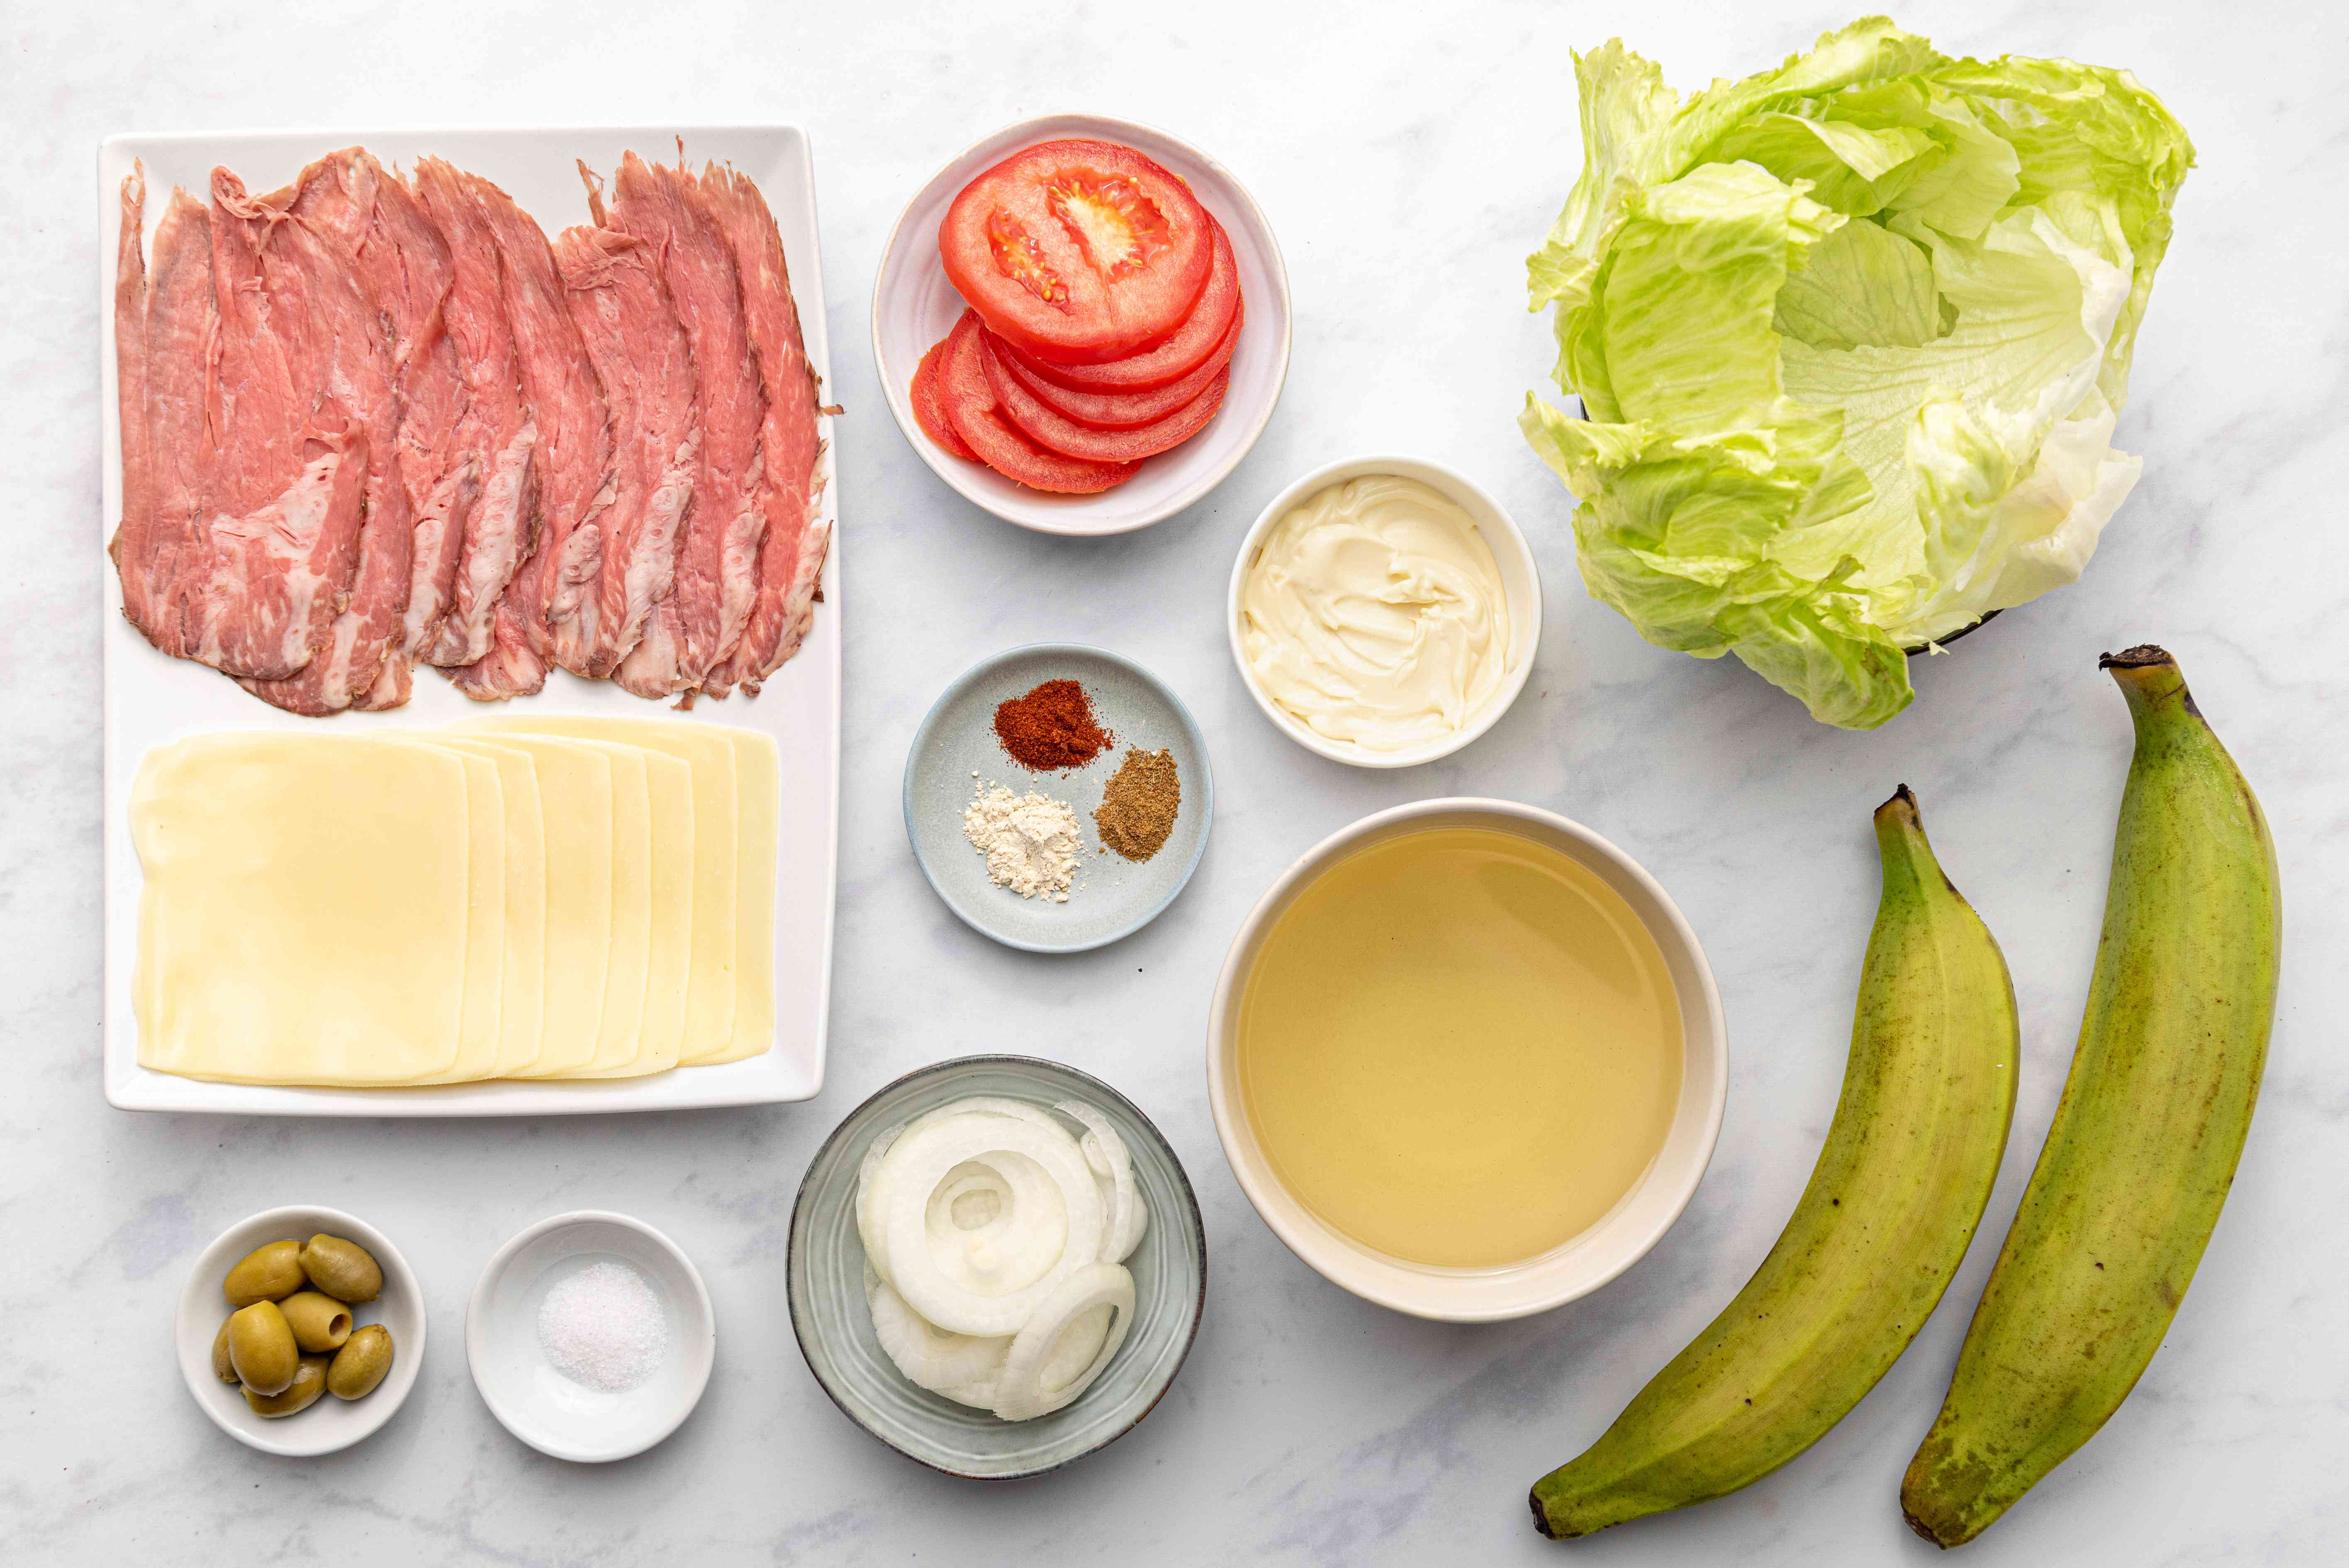 Smashed Plantain Sandwich (Jibarito) ingredients